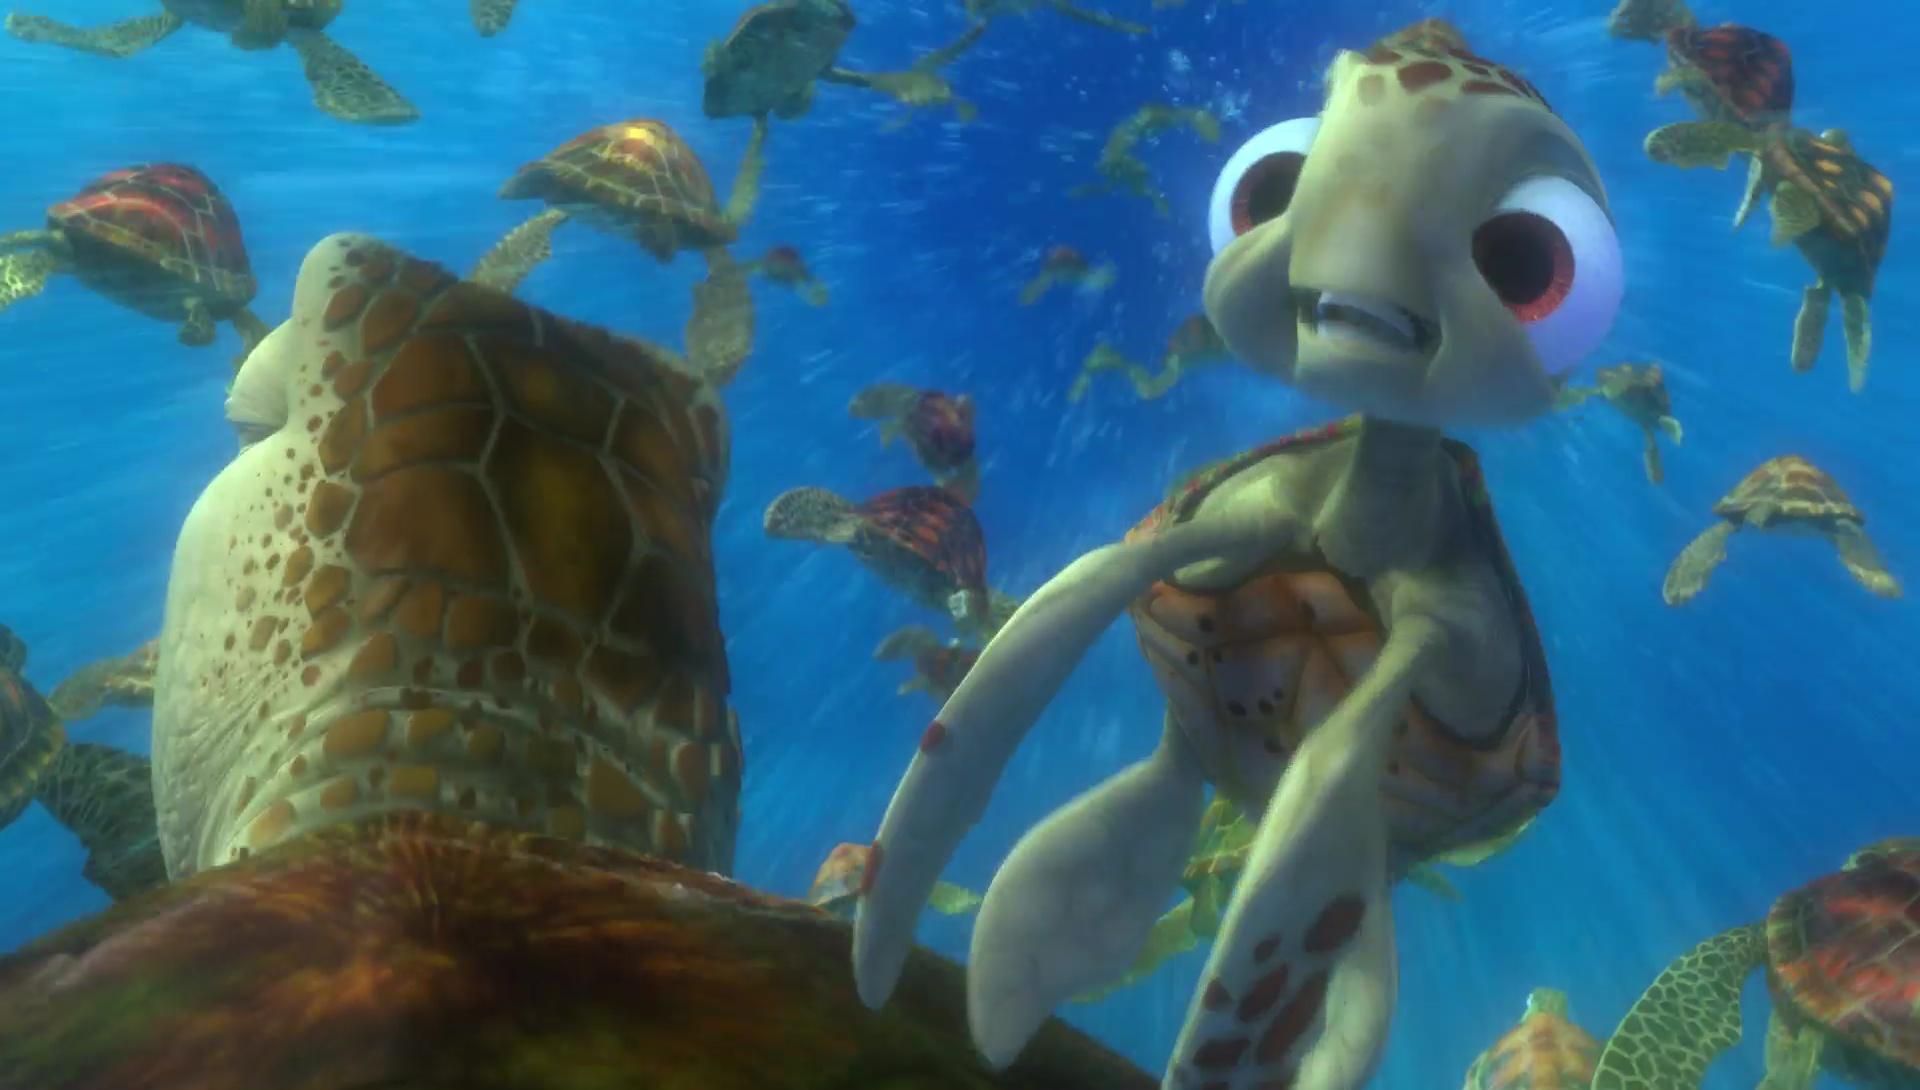 squiz squirt monde finding nemo disney pixar personnage character